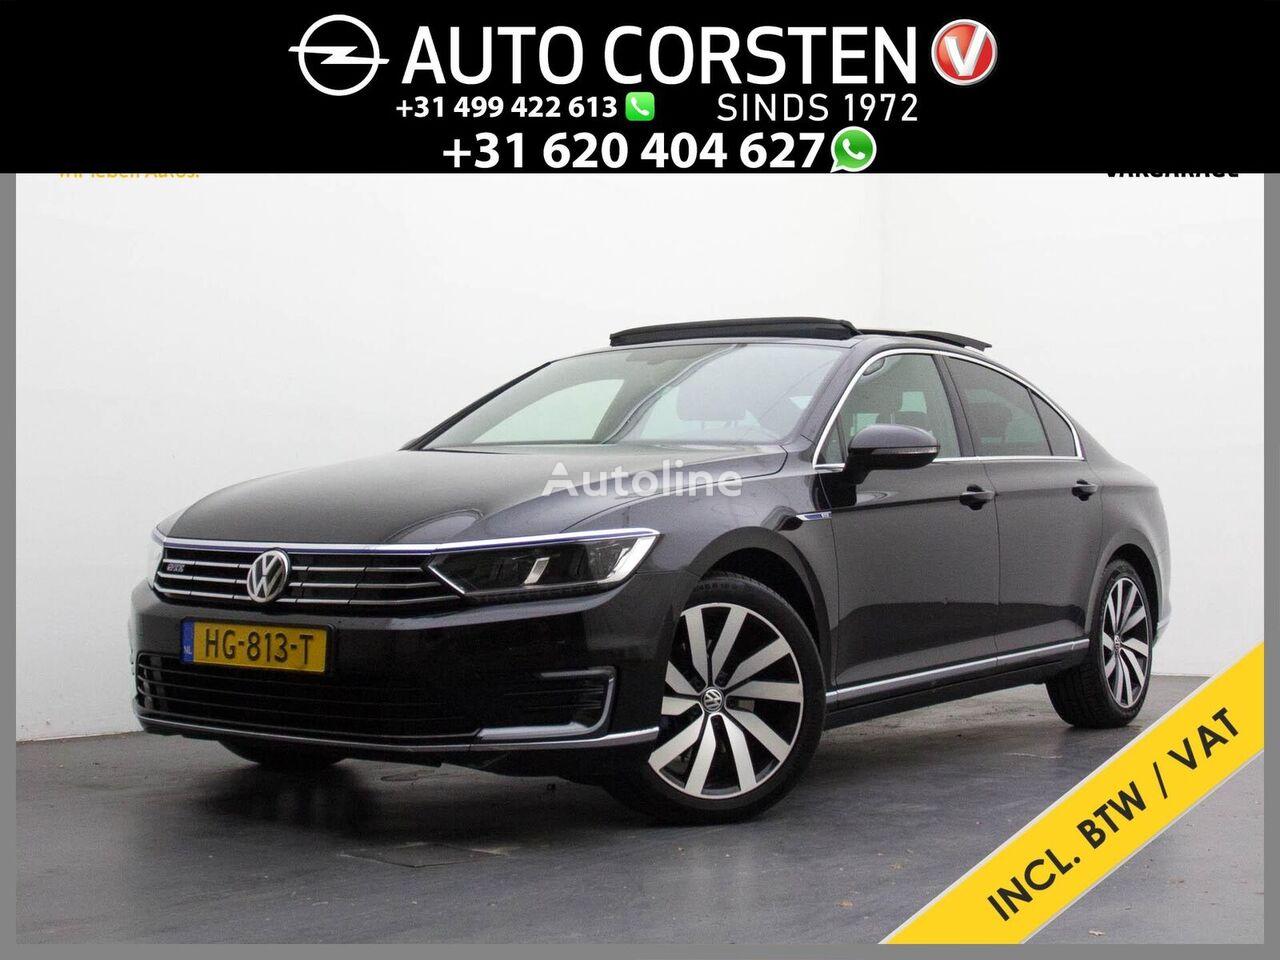 Volkswagen Passat Sedan For Sale Netherlands Mariahout Qd23894